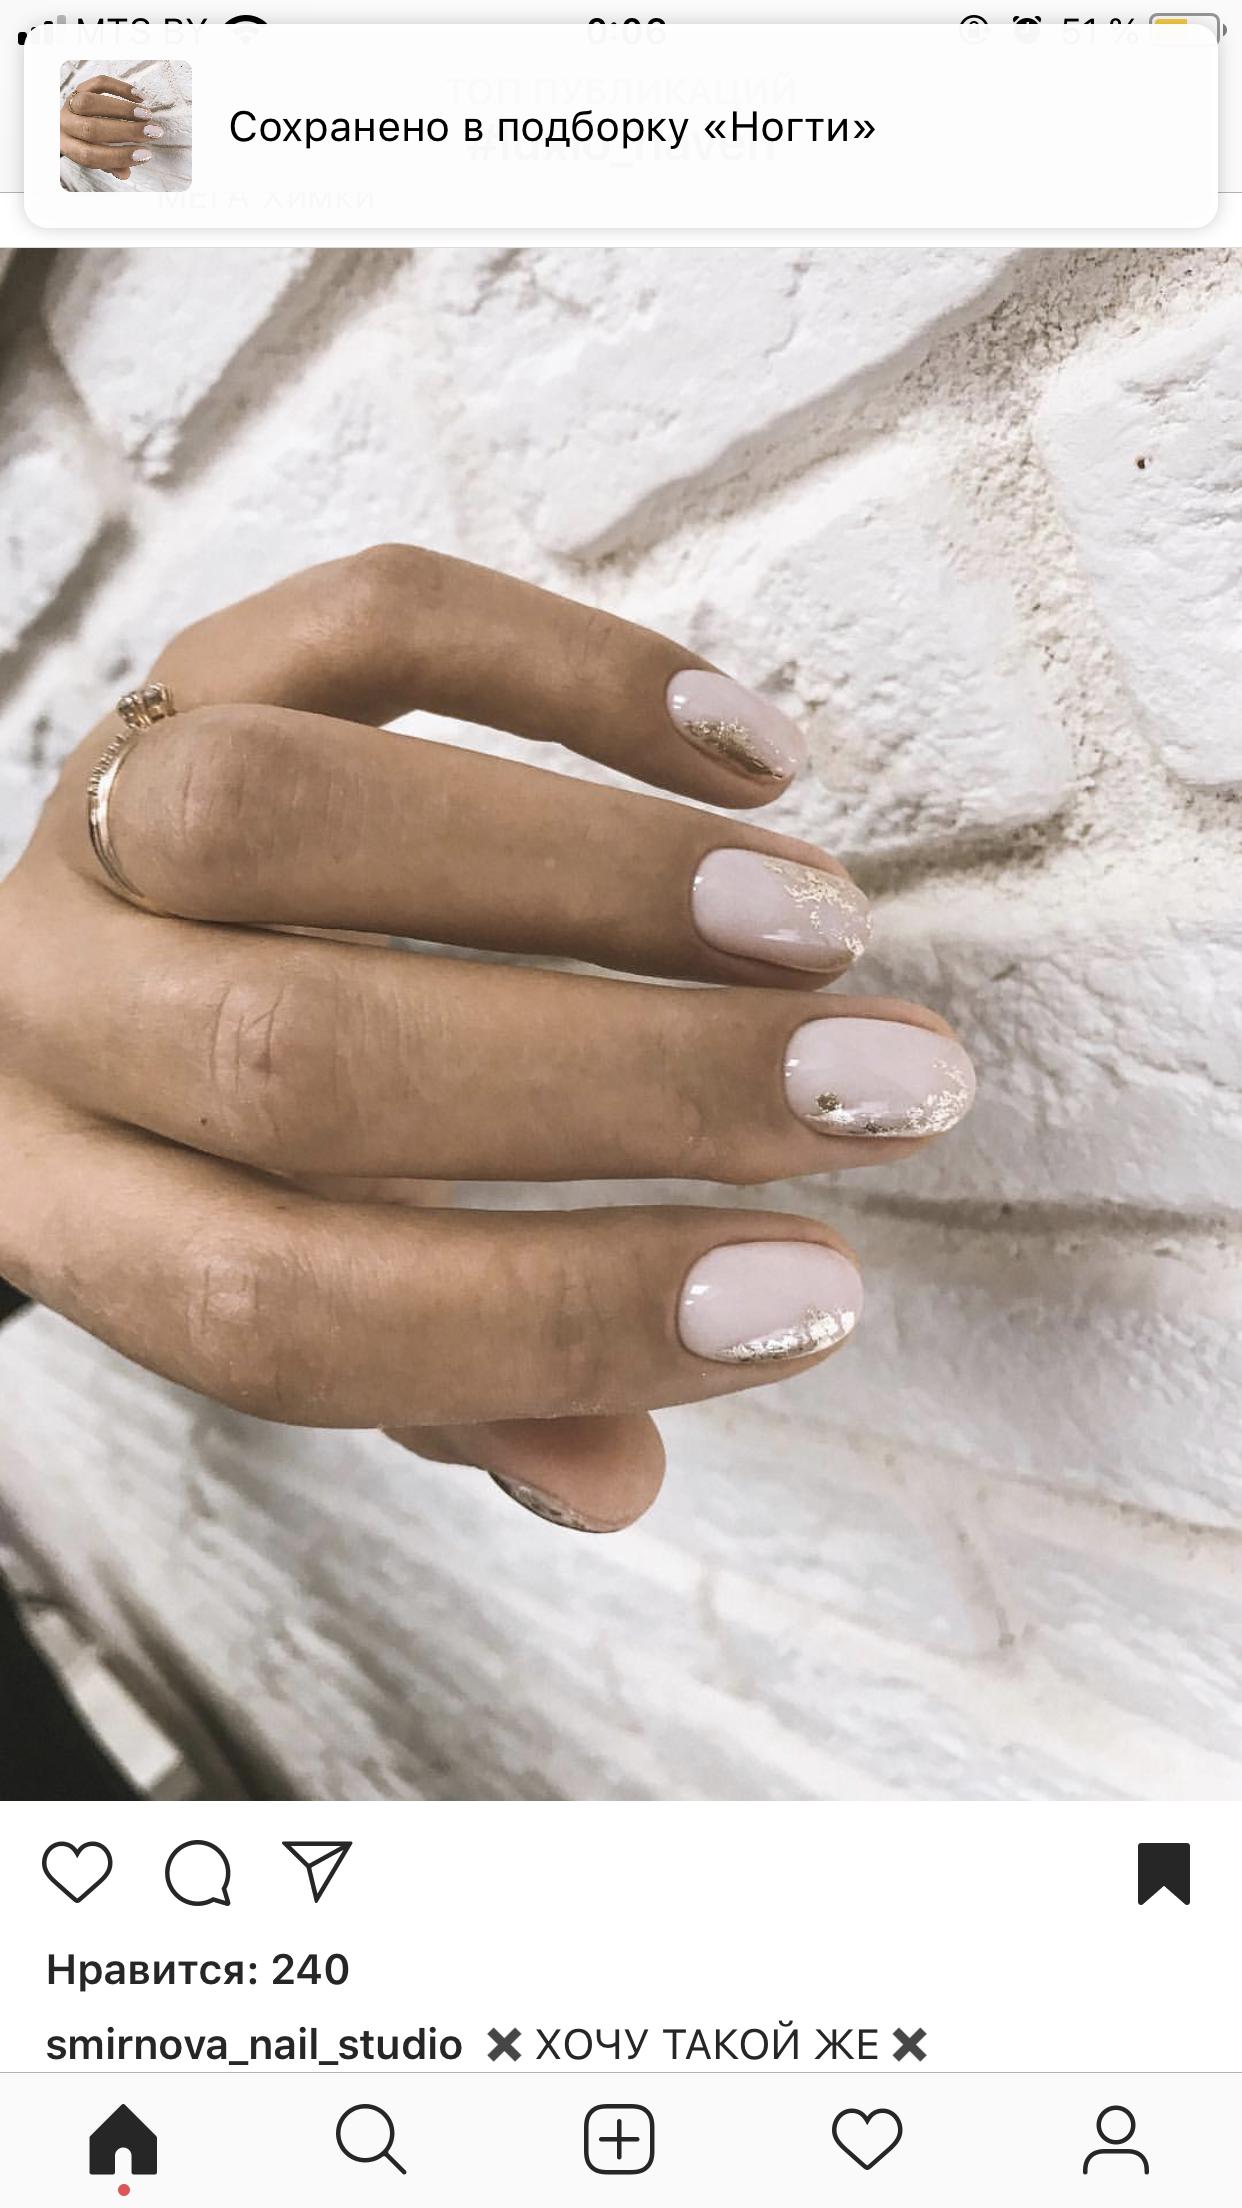 Angie Perez Nude pinangie perez on nails in 2019 | minimalist nails